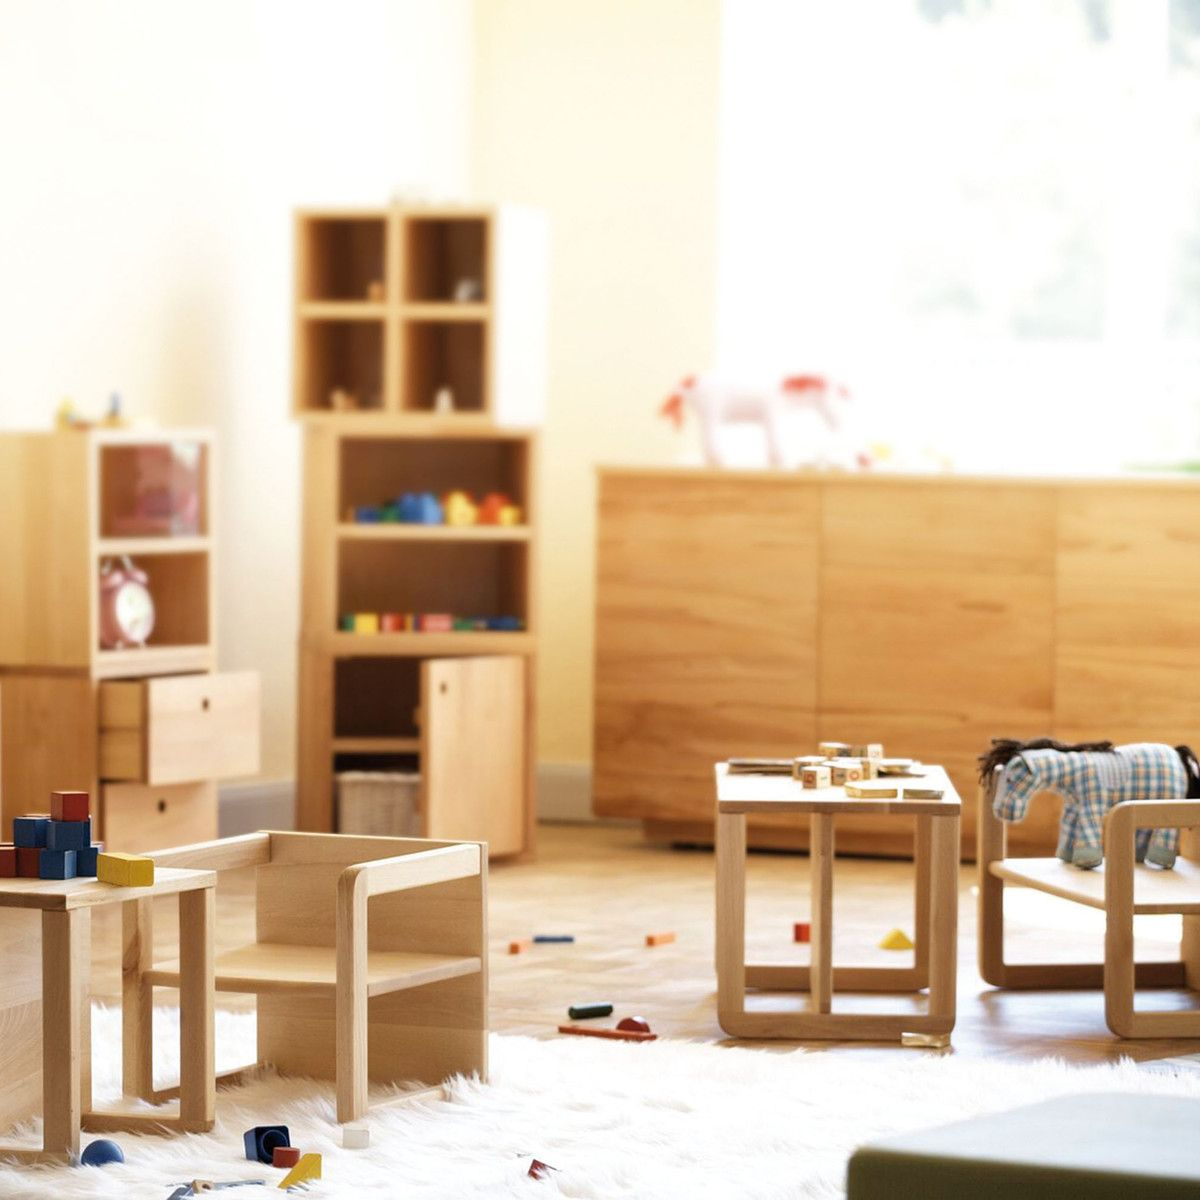 Kindermöbelversand nett kindermöbel versand детские игрушки и мебель